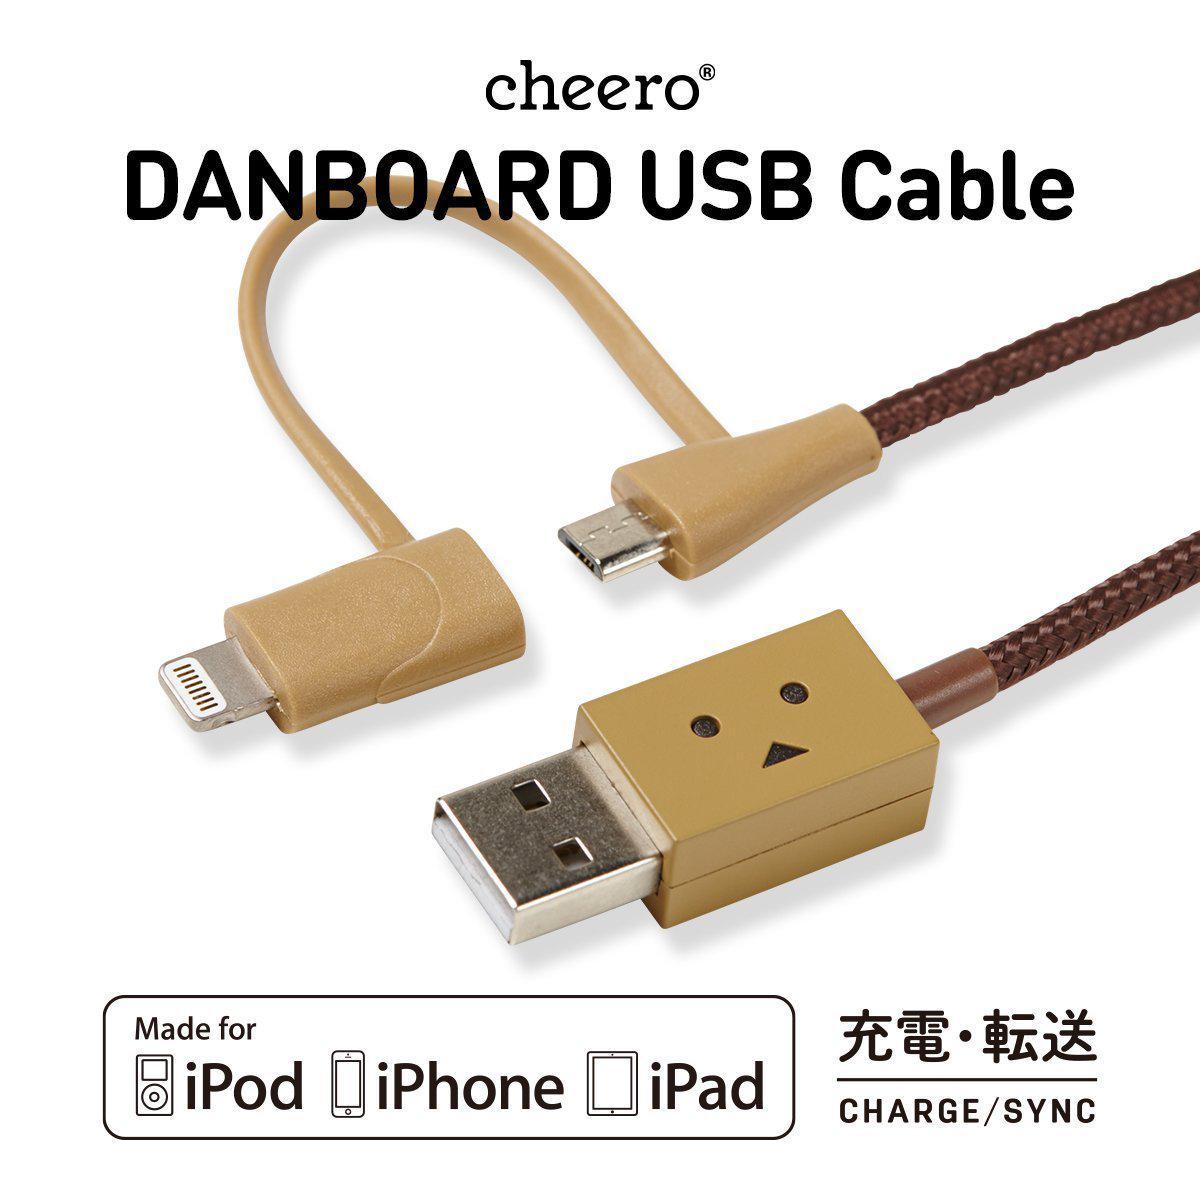 #Sailing推荐您买 眼睛会亮哦! Amazon限定 纸盒人 USB iPhone Android 数据线 日本正品代购 http://t.co/kCTegWwu6L http://t.co/1u1V3zNAow